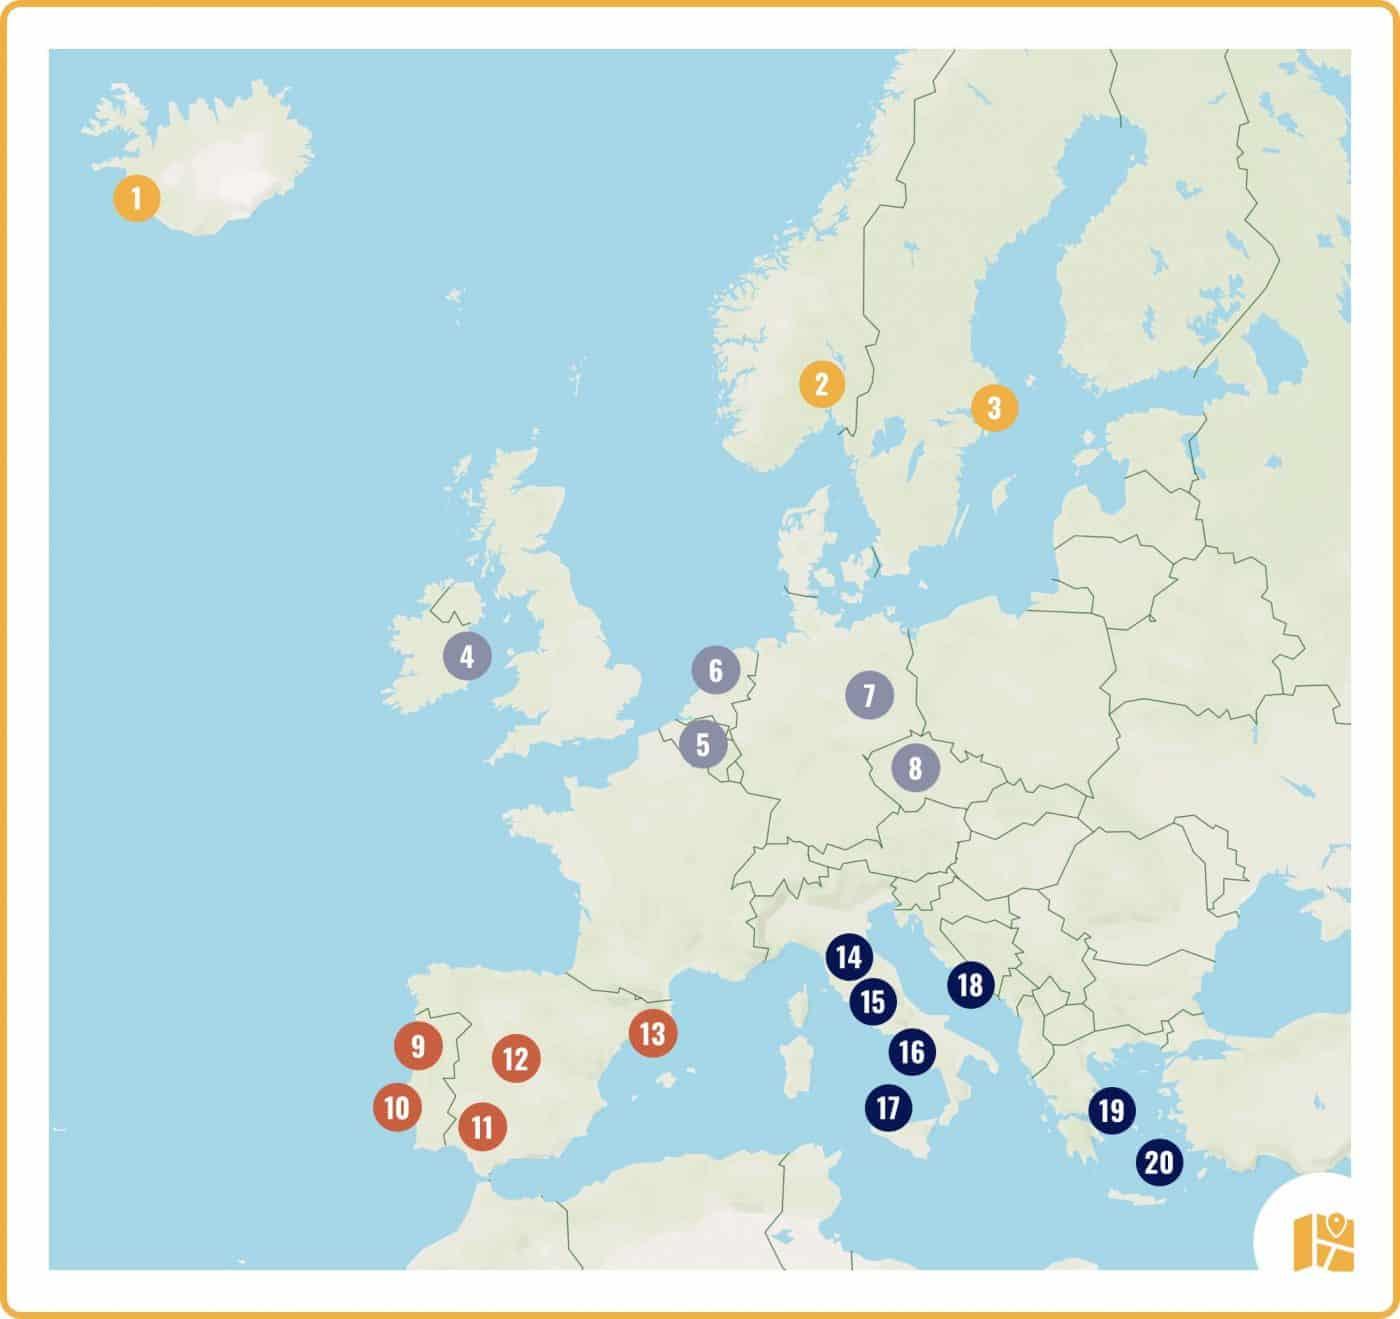 Carte de 20 idées de week-end en Europe